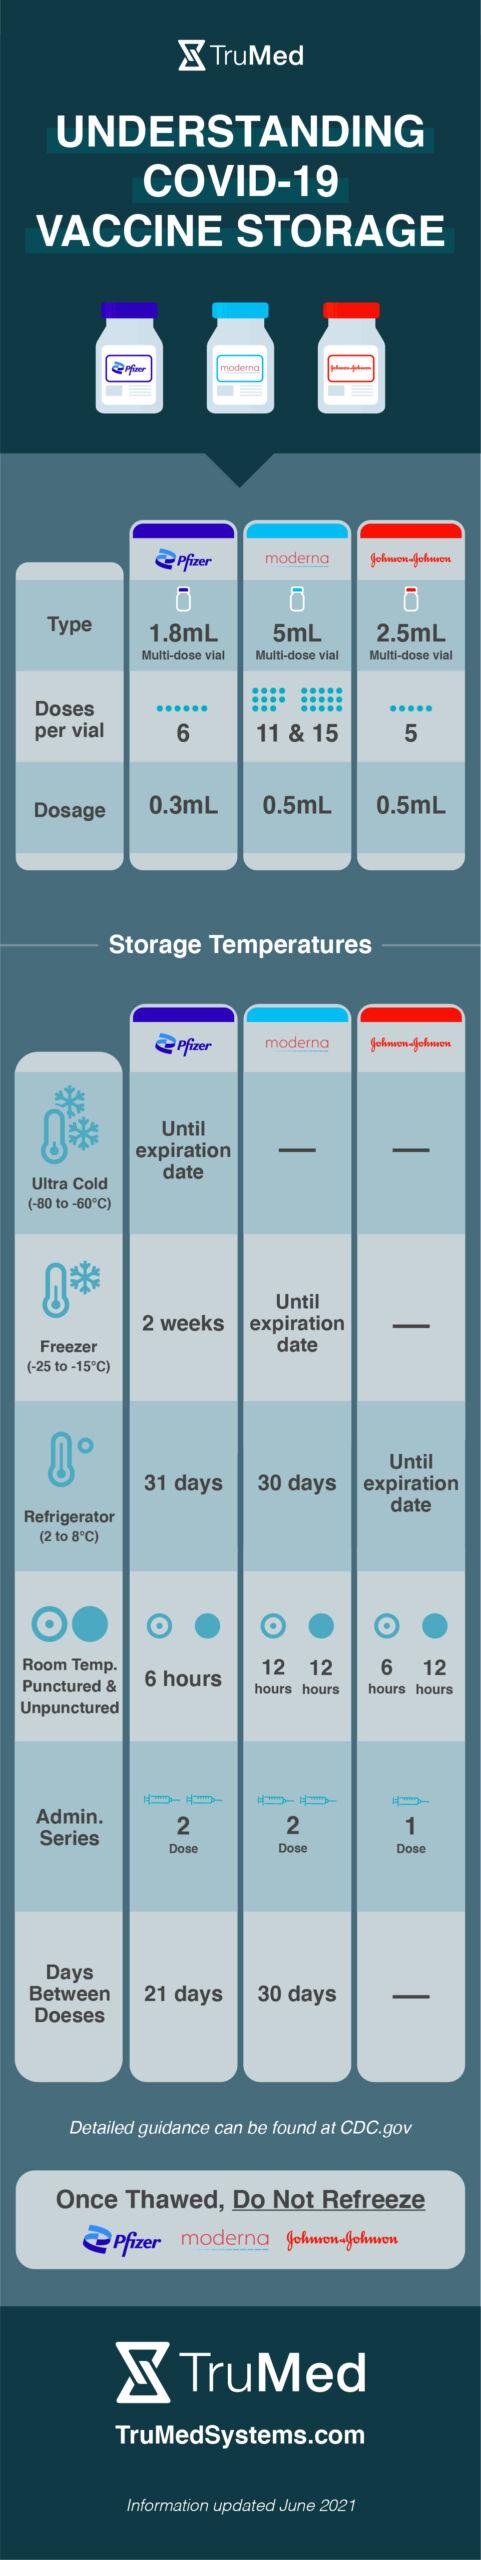 COVID-19 vaccine storage infographic